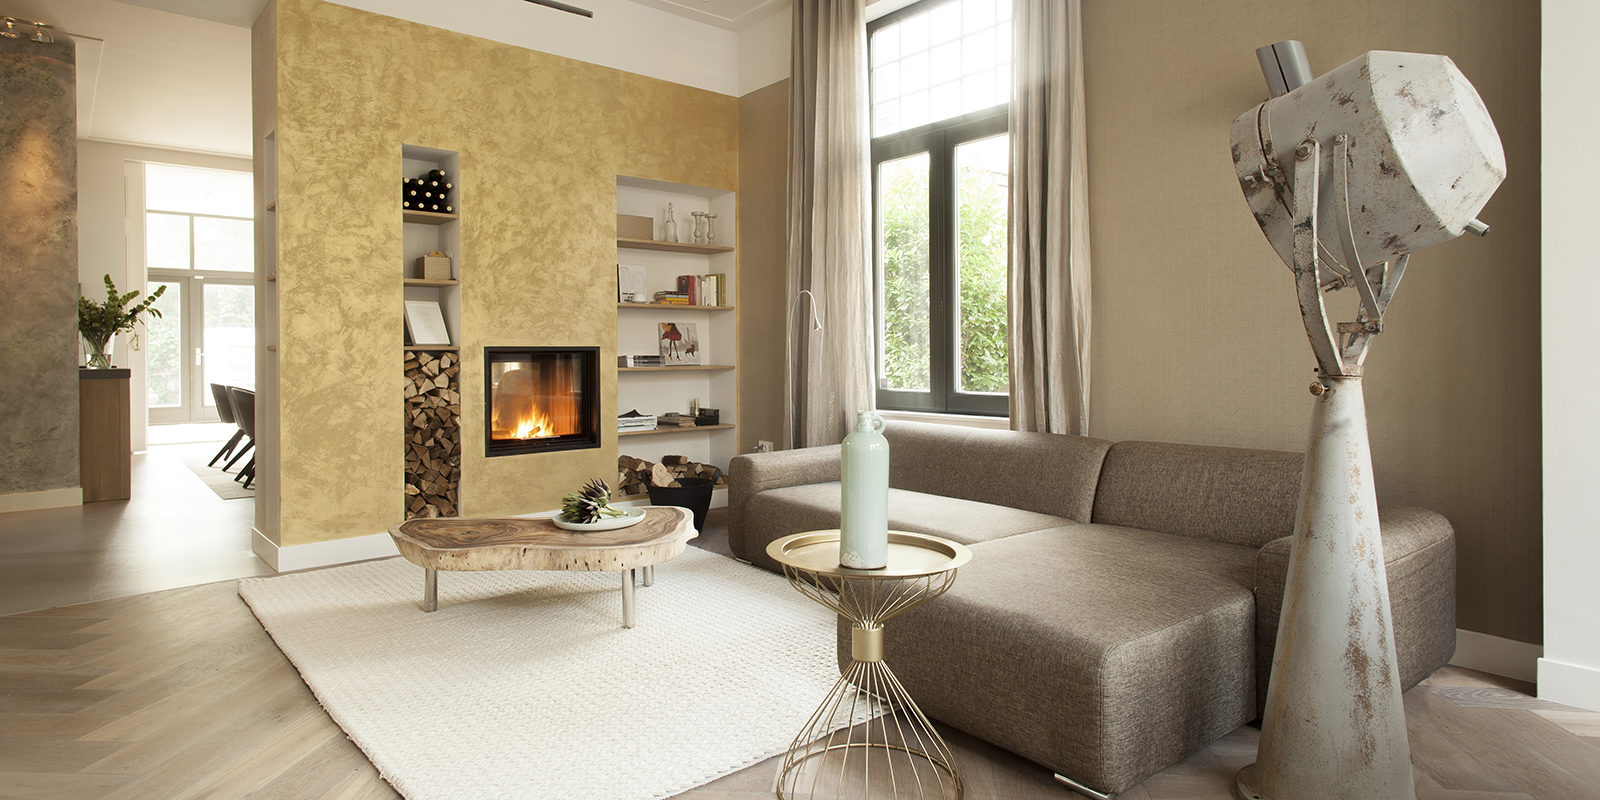 Woonaccessoires, Interieur accessoires, Woonstijlen, Woontrend, Interieurtrend, modern interieur, Strak interieur, Gezellig interieur